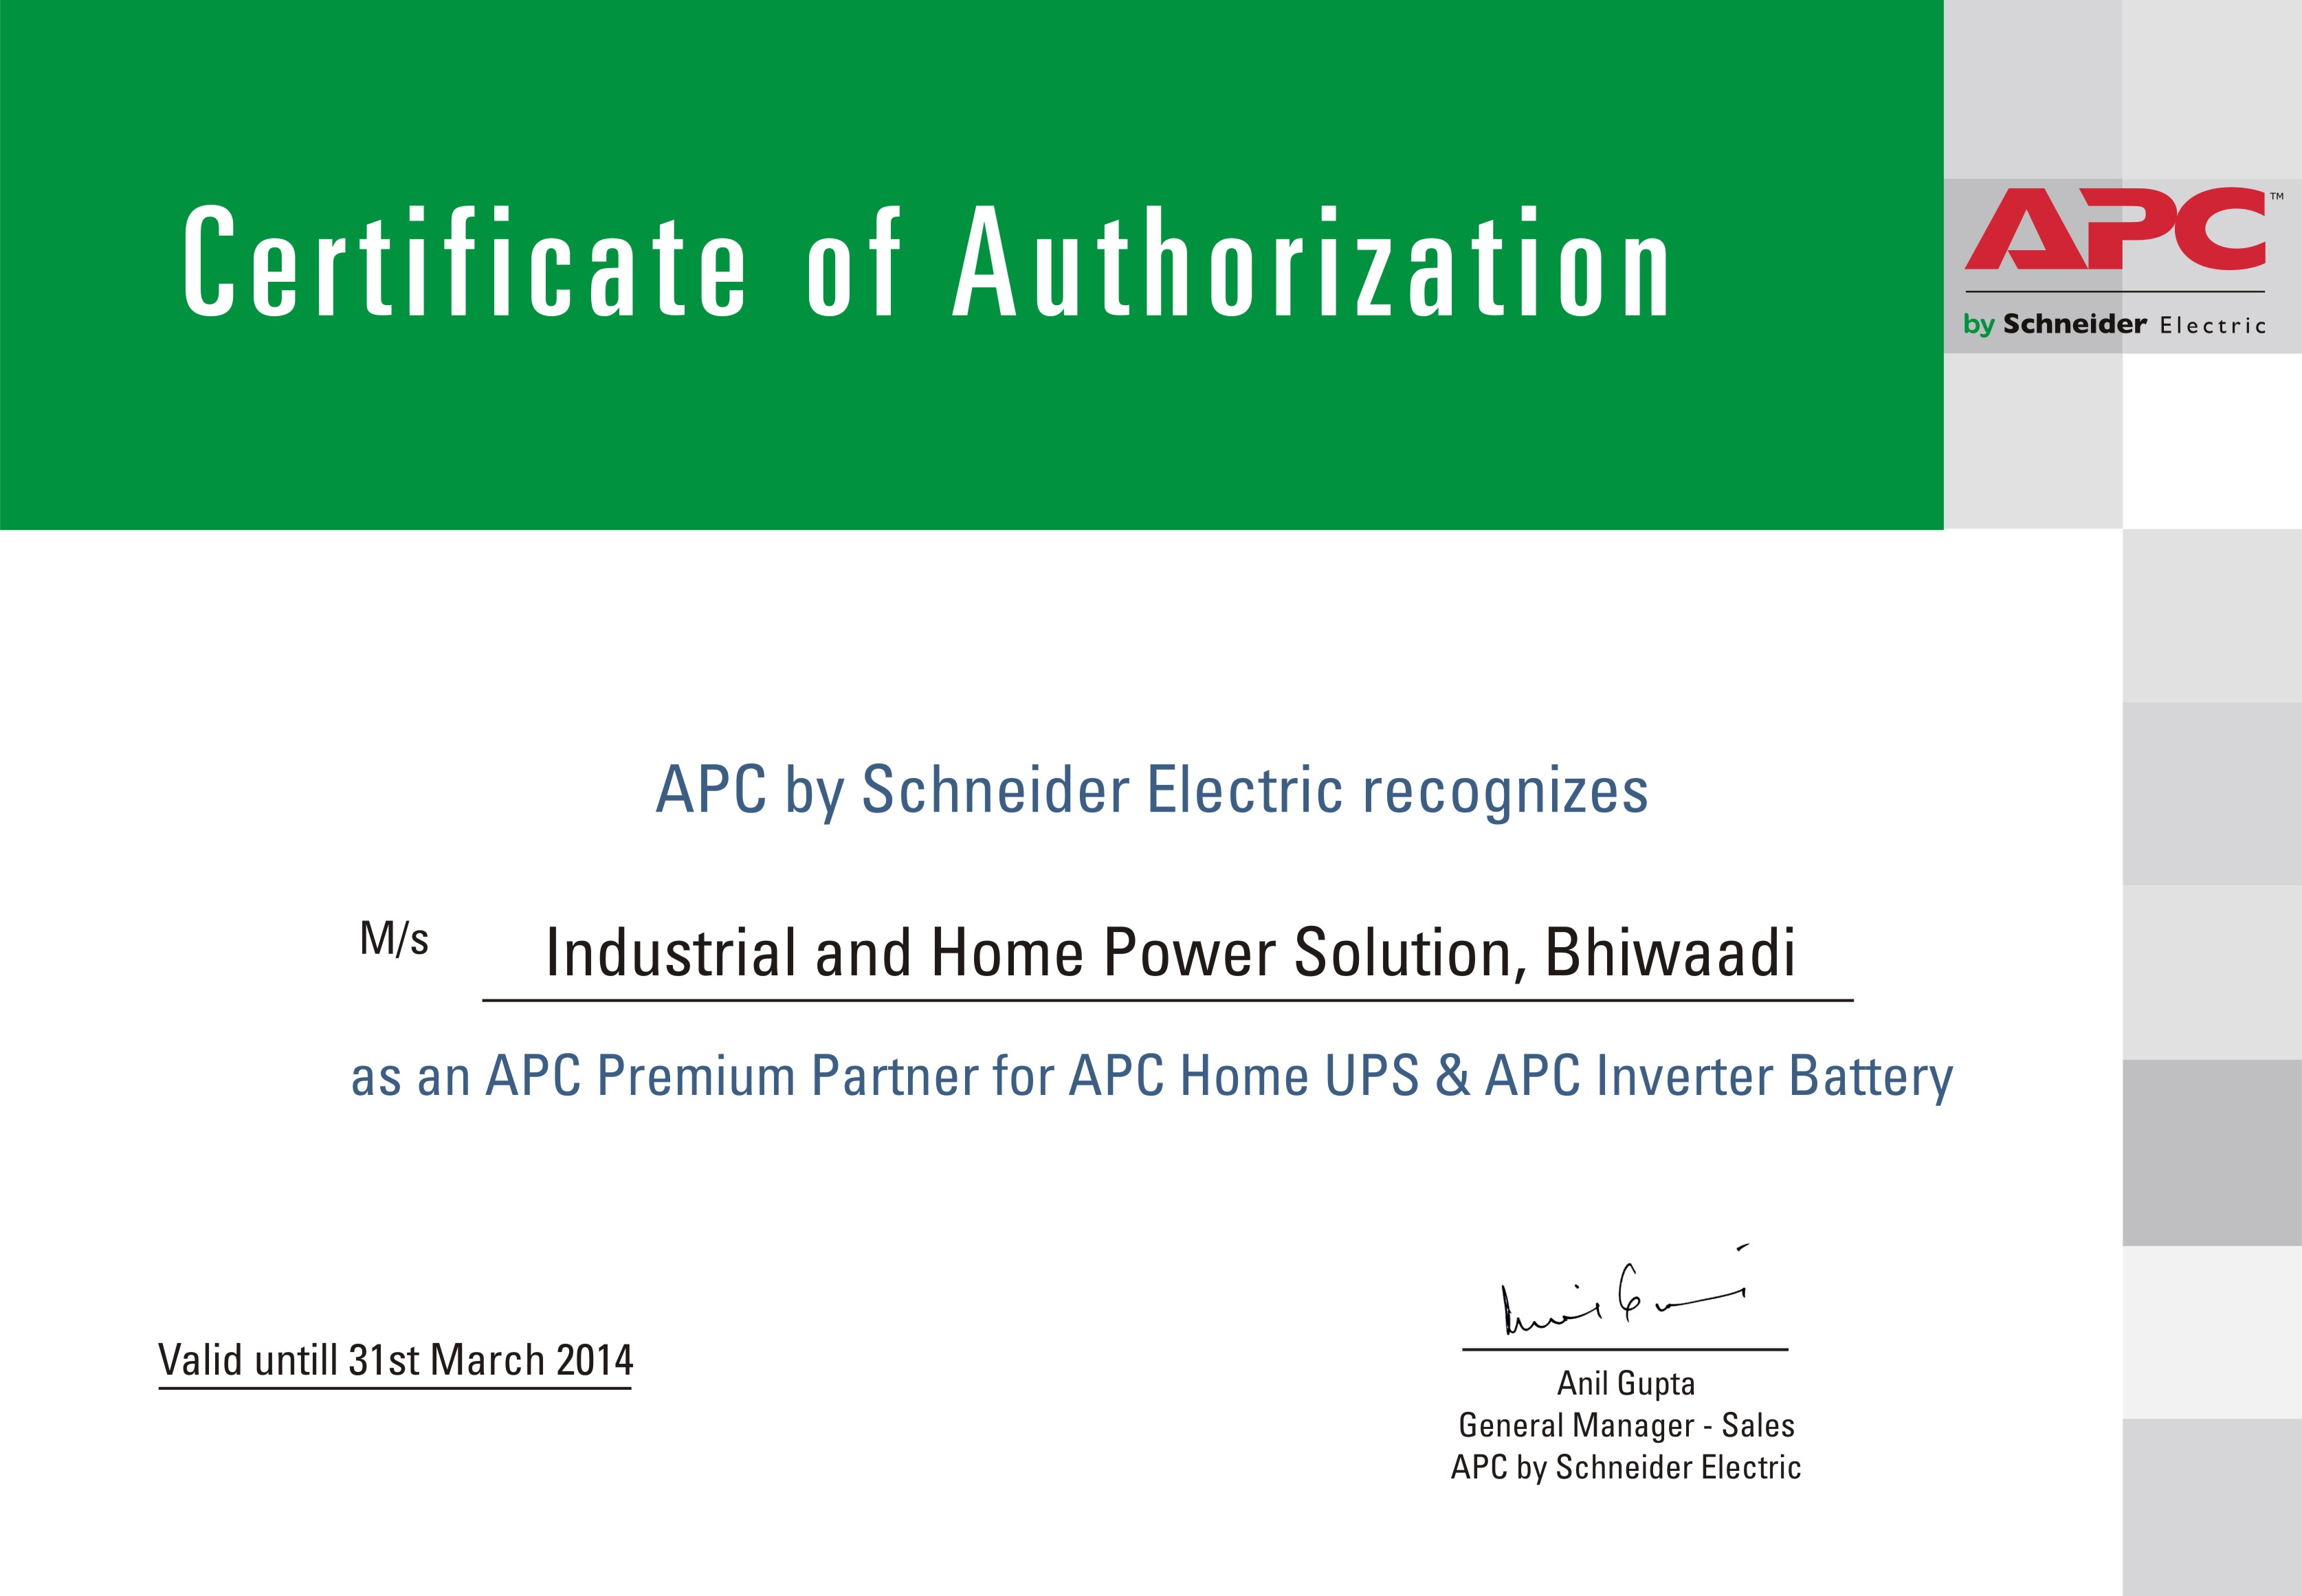 APC Certificate